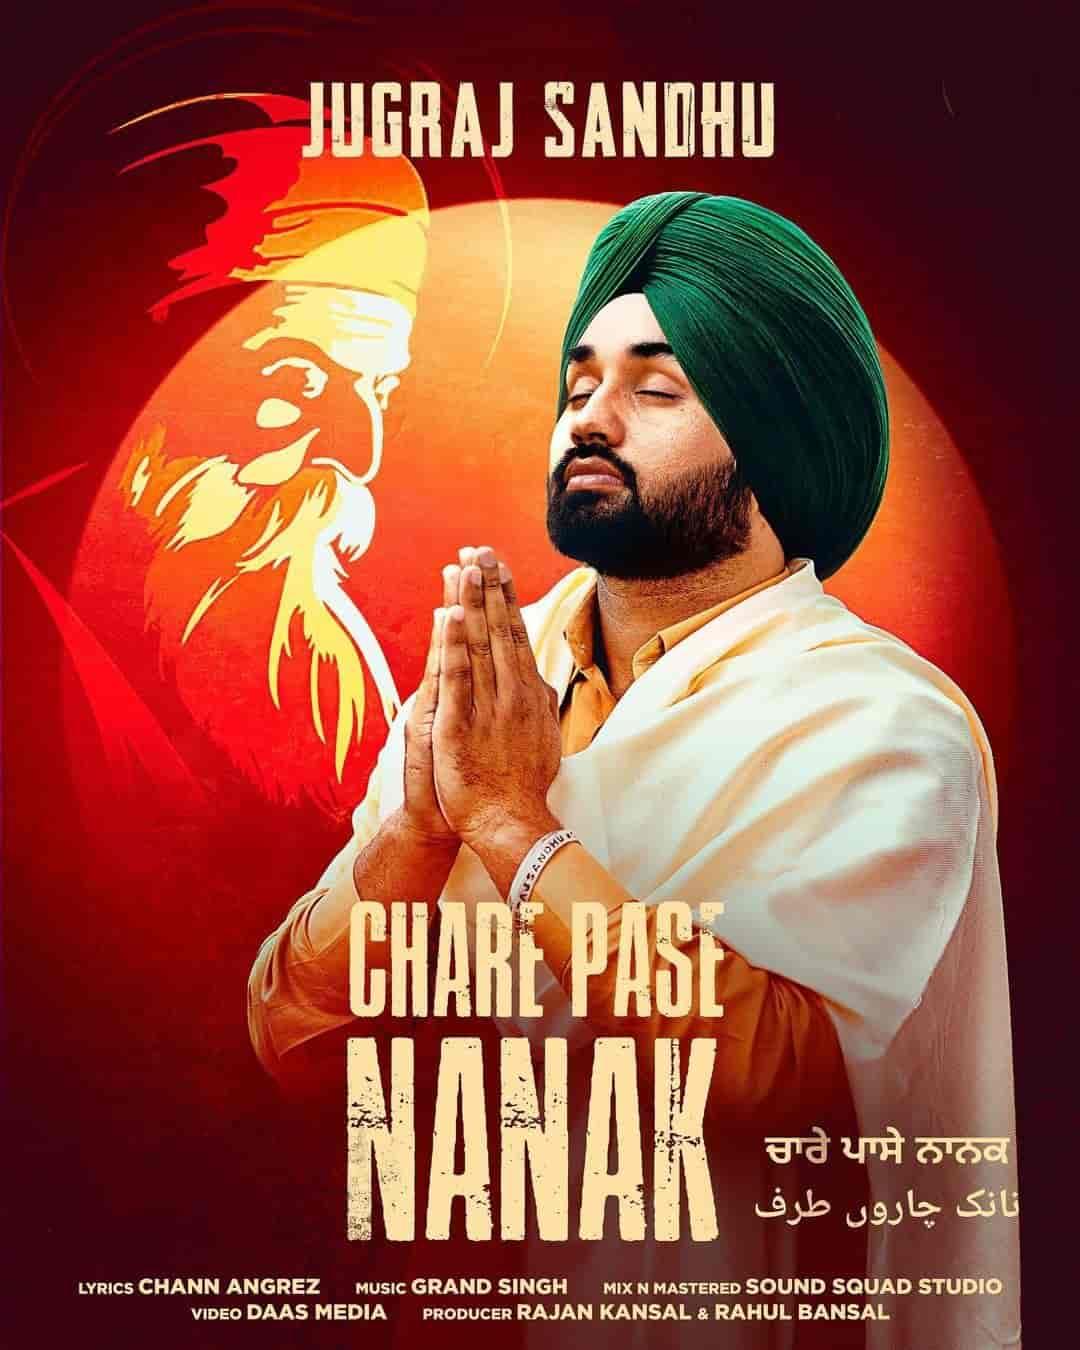 Chare Pase Nanak Punjabi Song Image Features Jugraj Sandhu